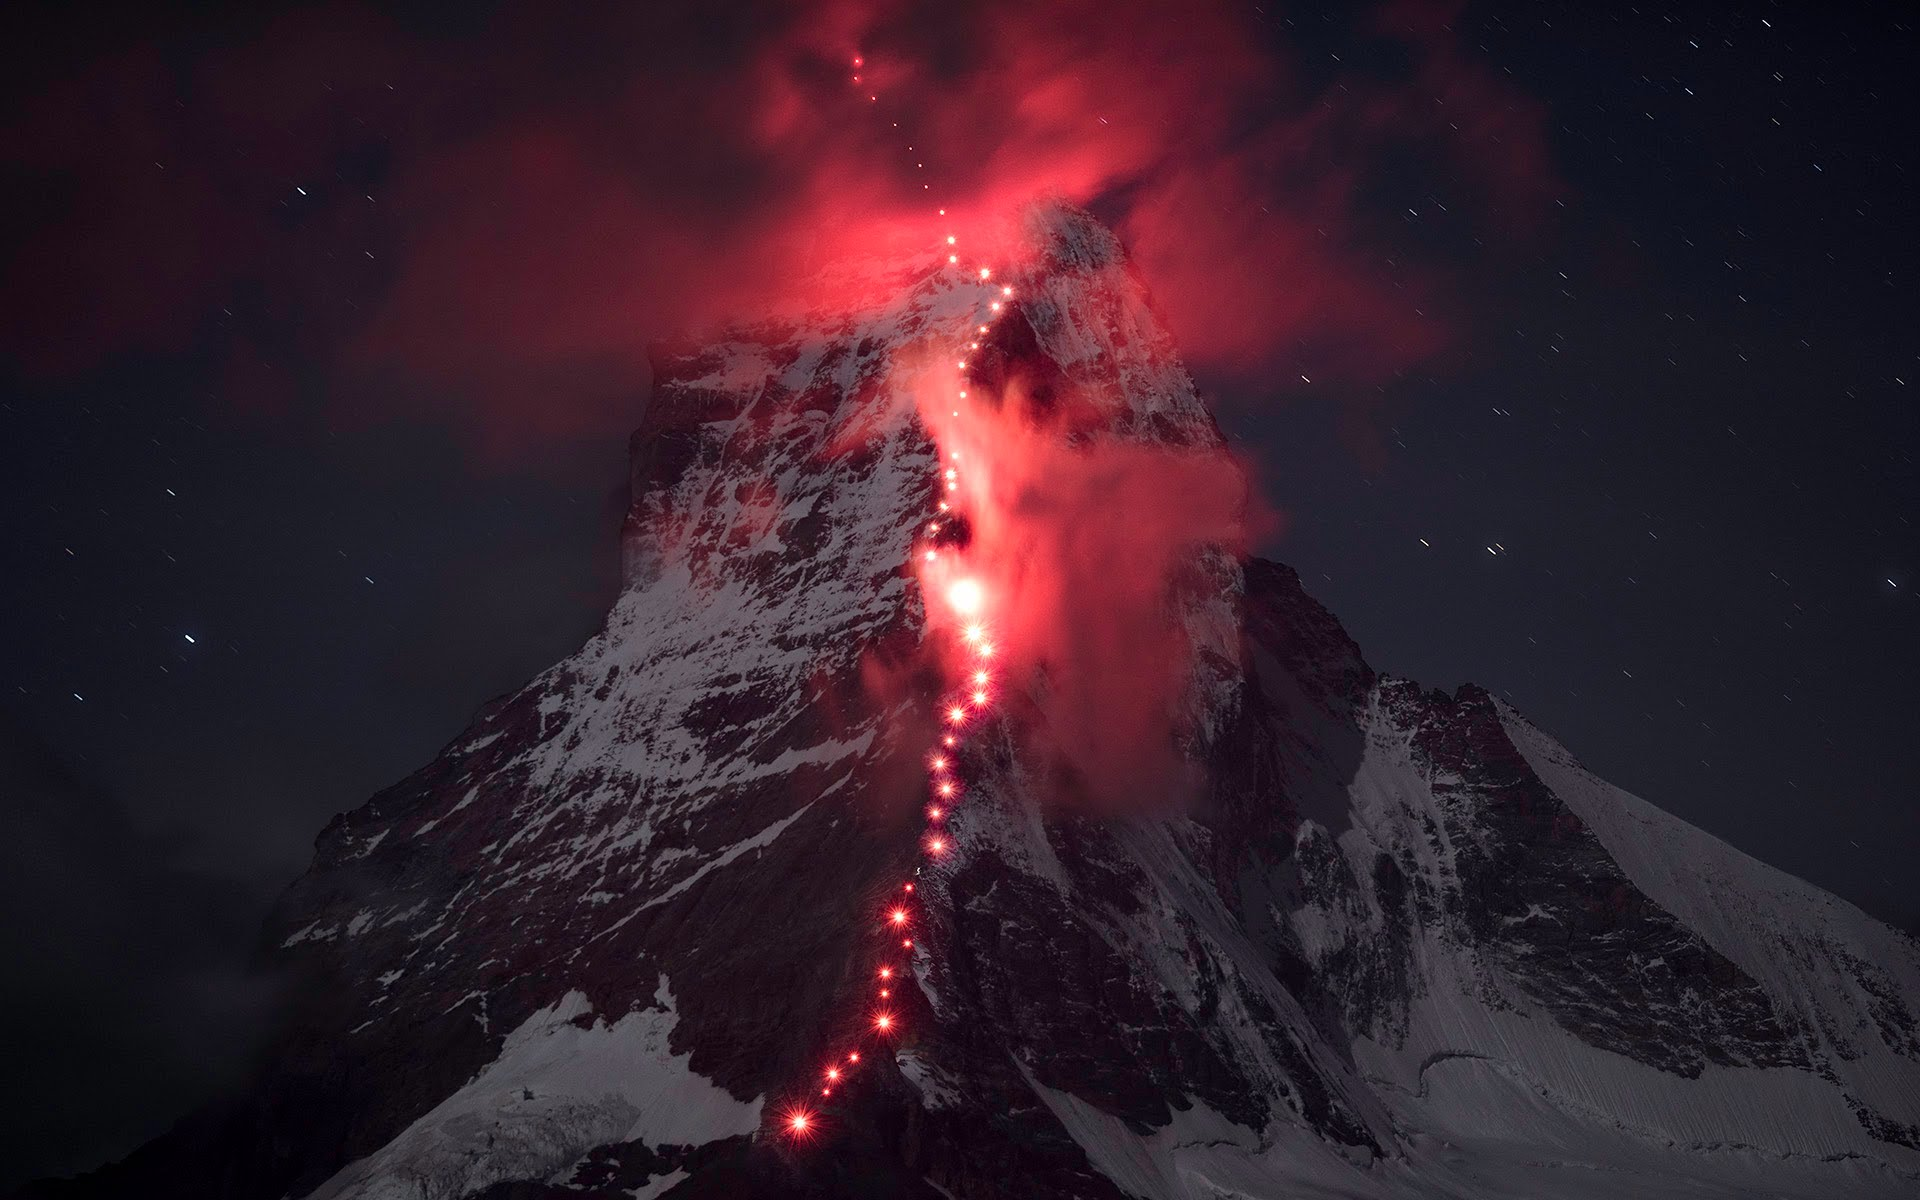 Making of del homenaje de Mammut al 150 aniversario de la primera ascensión al Matterhorn